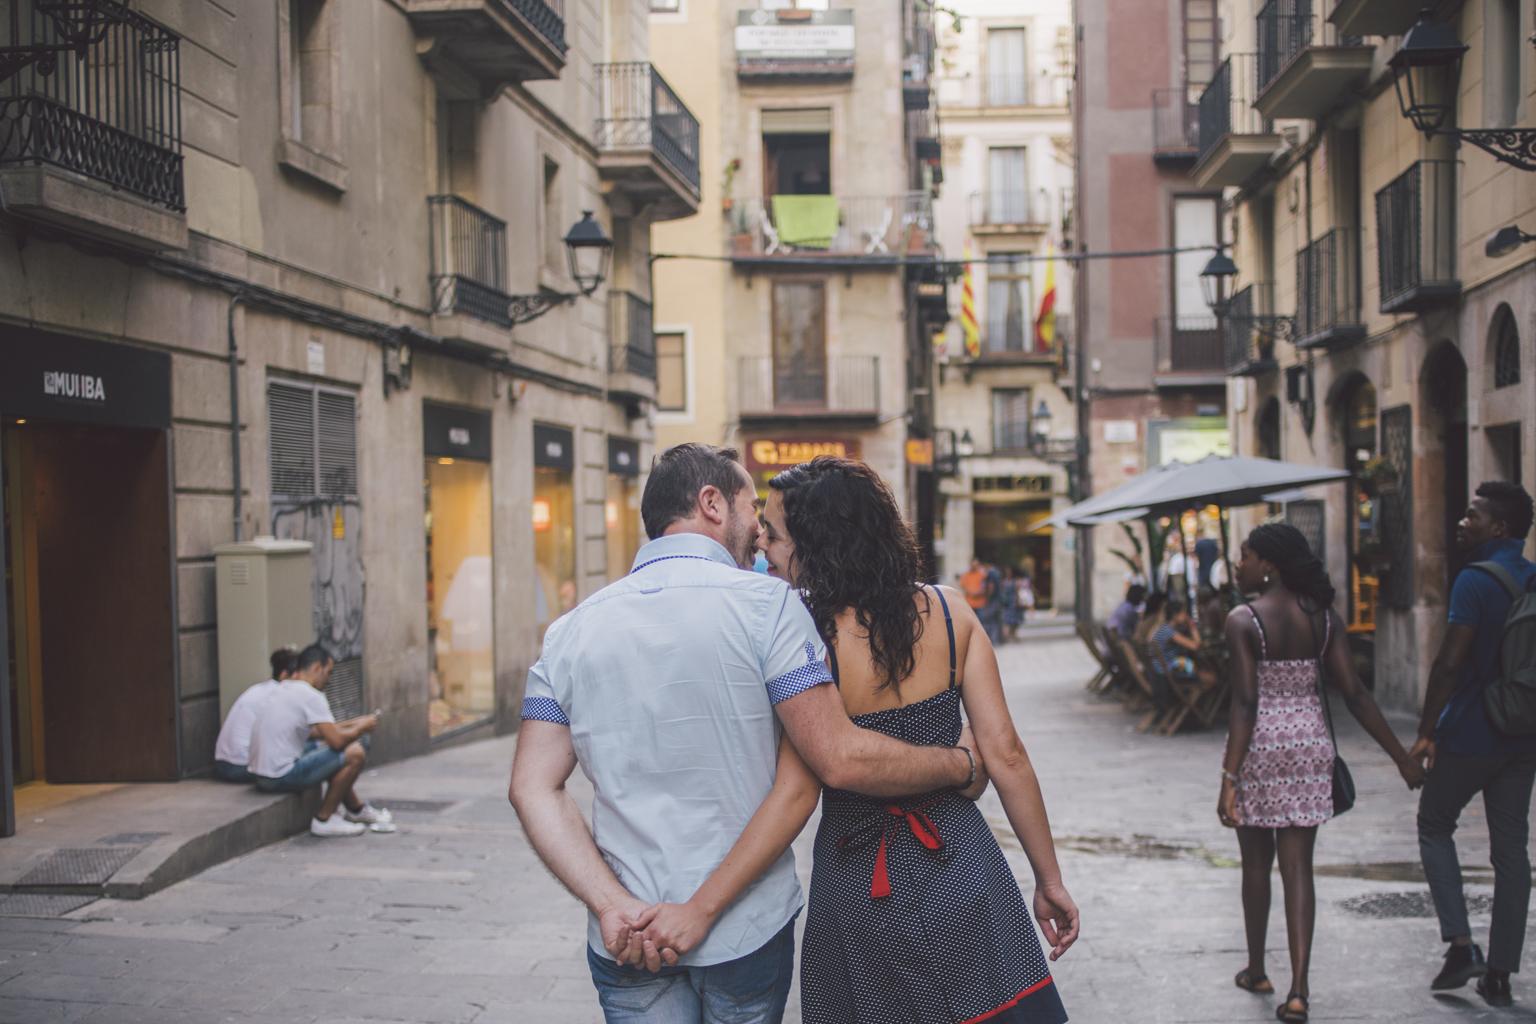 fotógrafo de pareja barcelona :: fotógrafo preboda barcelona :: fotografía romántica :: reportaje de pareja barcelona